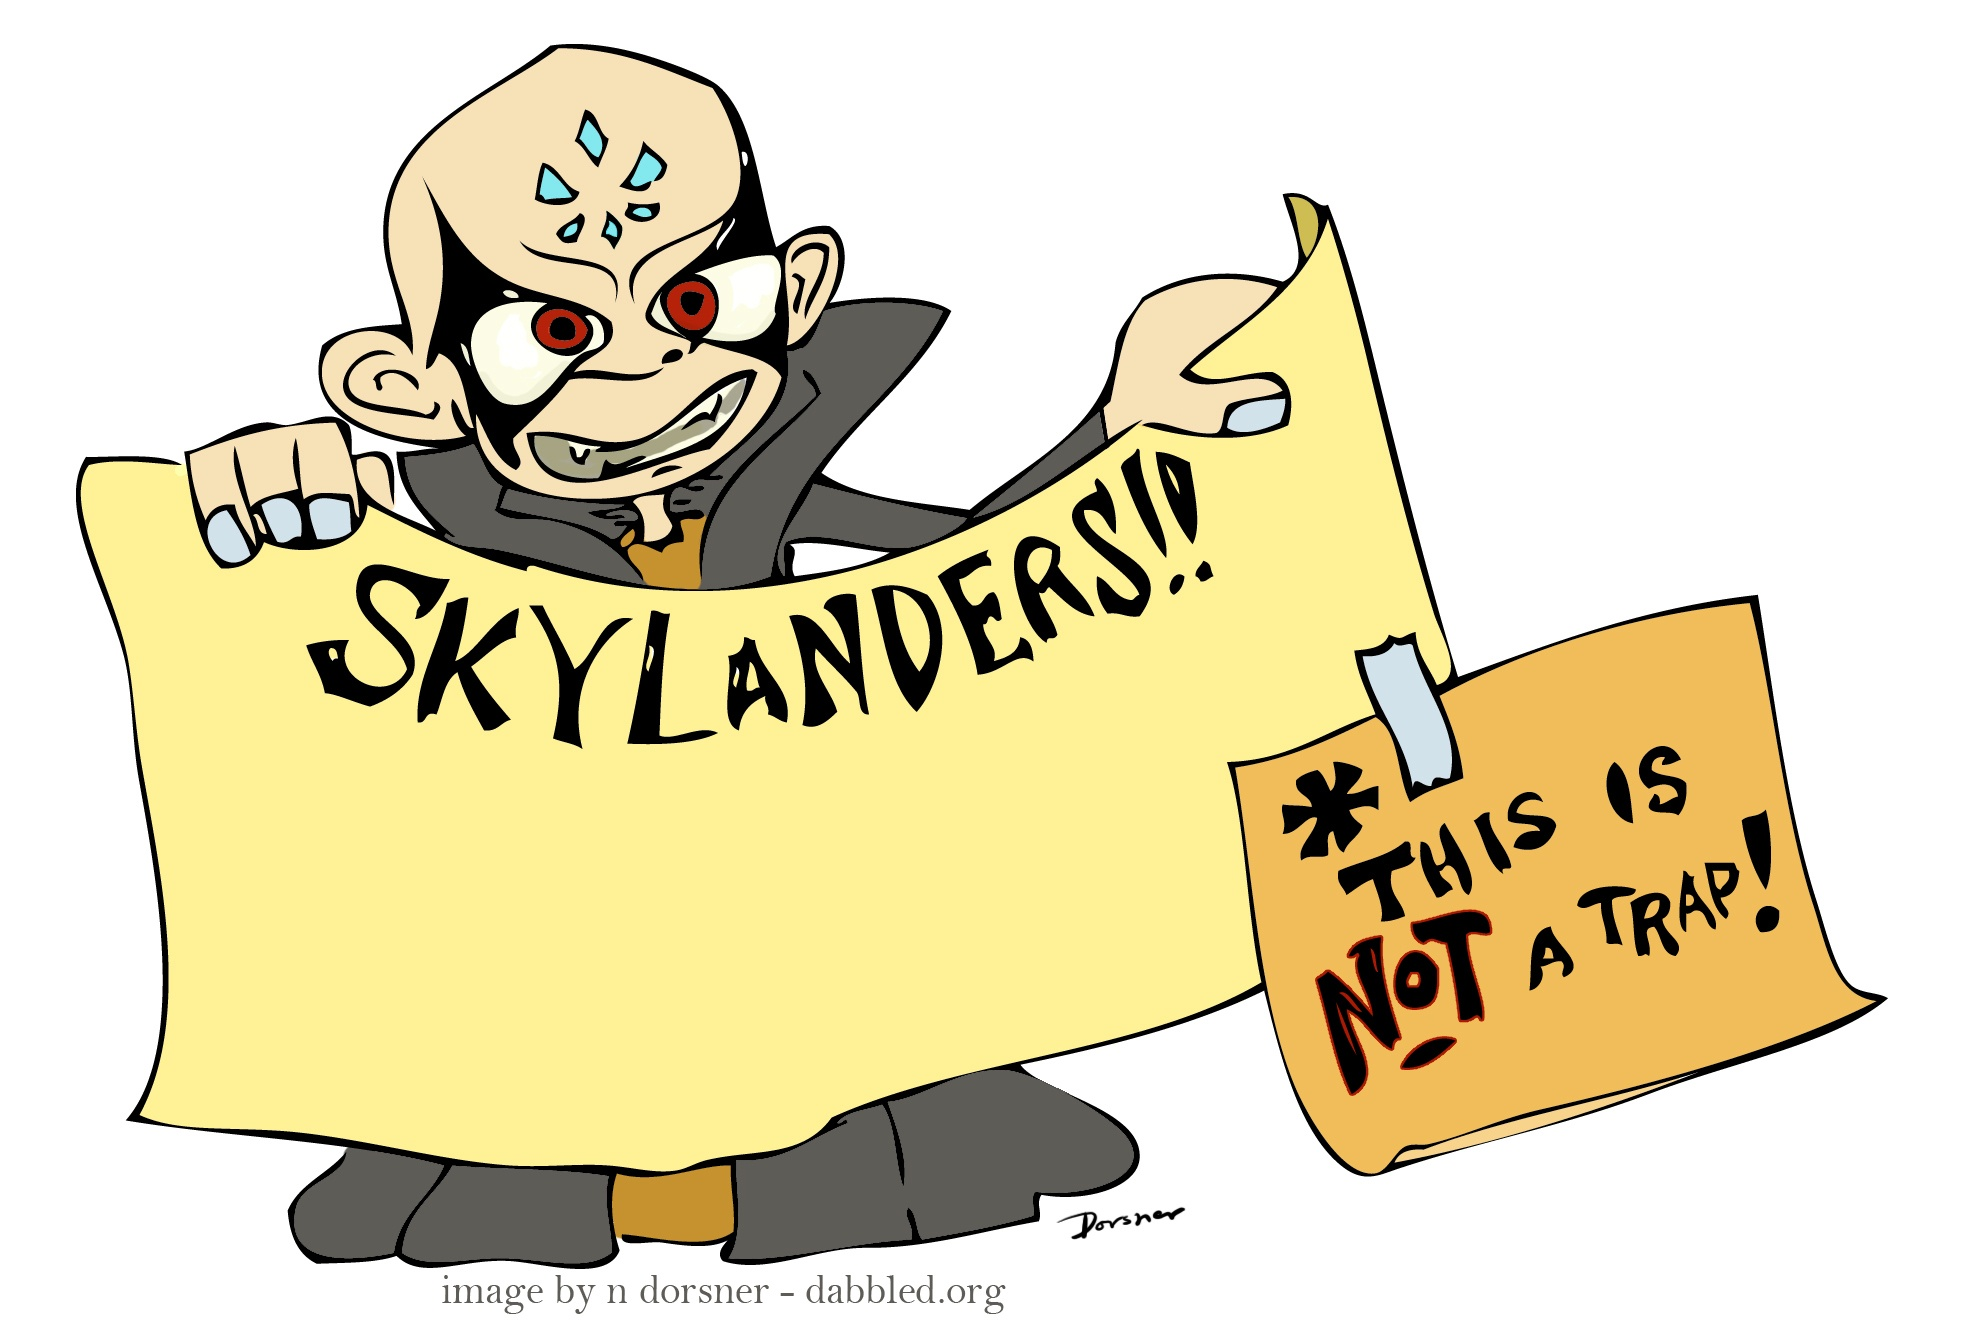 The Skylanders Party Highlights: The Invitation! (Free Printable - Free Printable Skylander Invitations